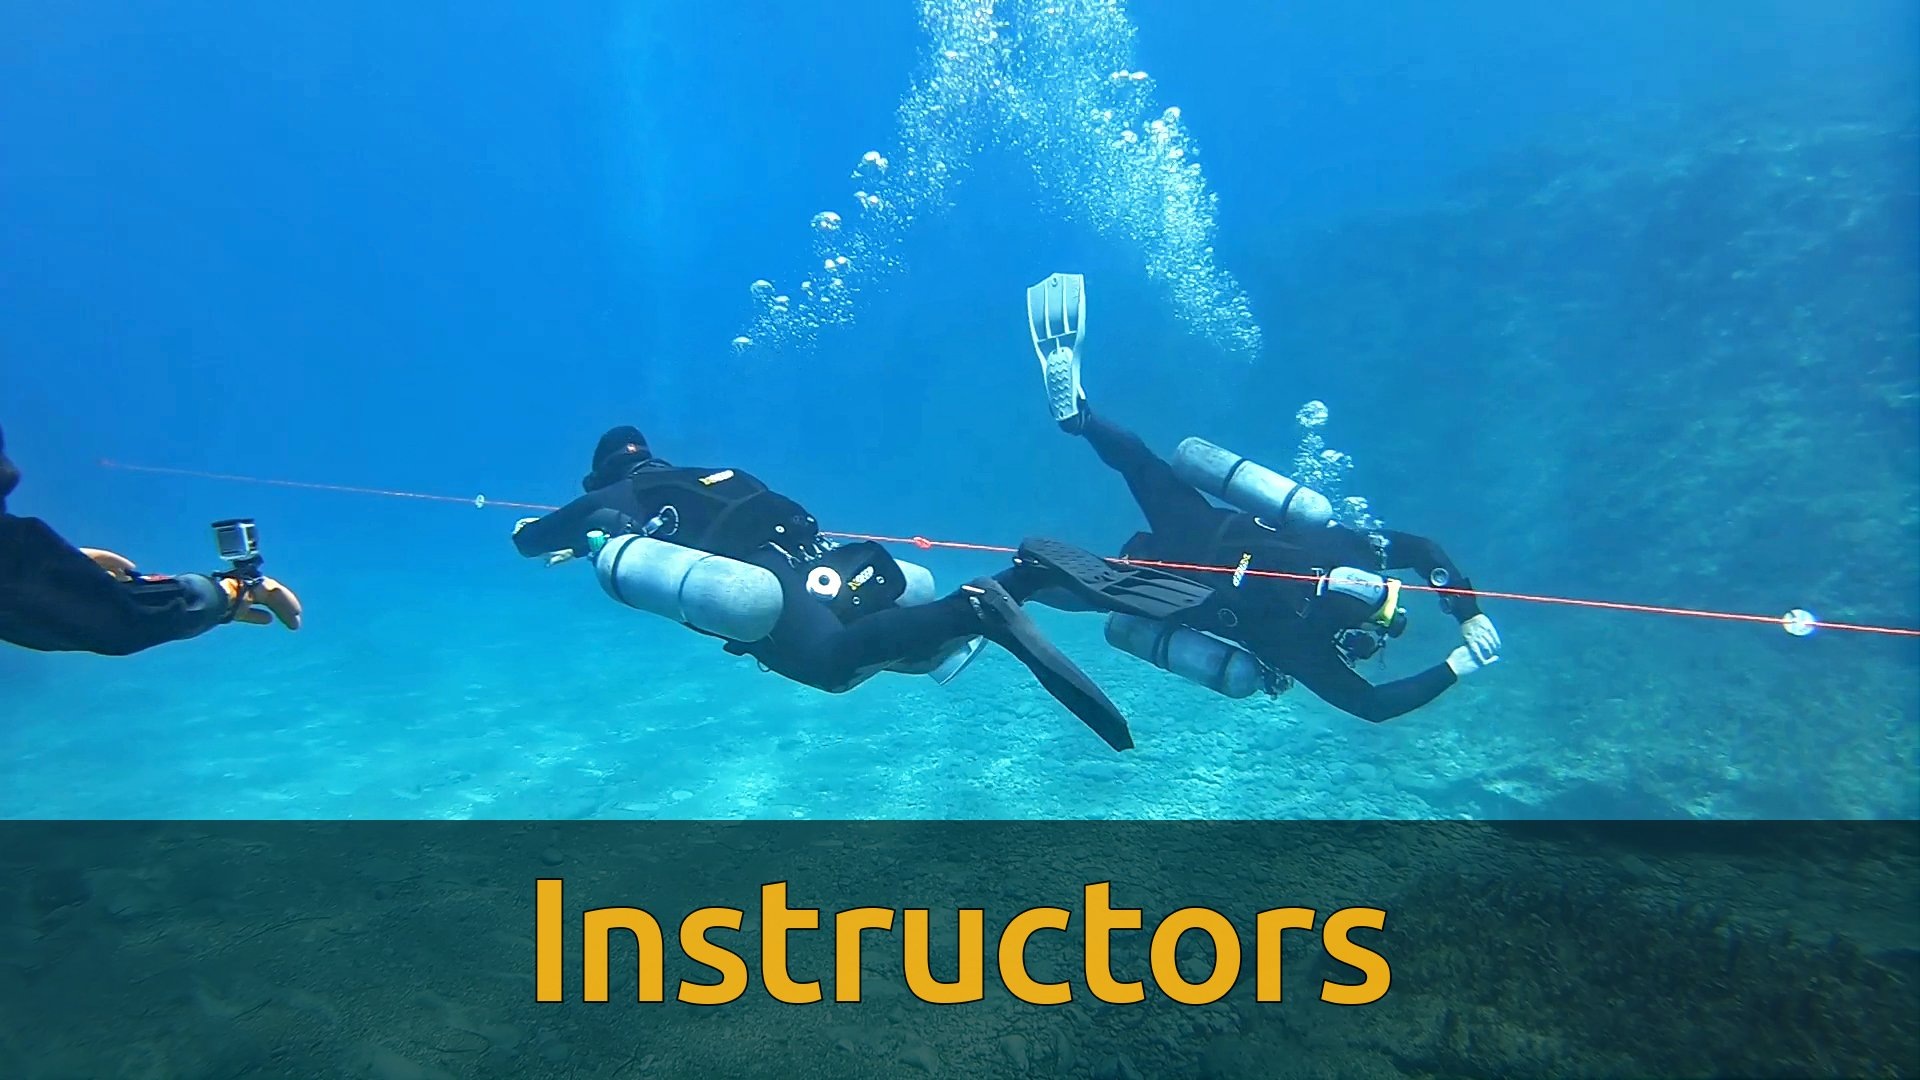 Instructor Series | 5 h 15 min split over 32 videos